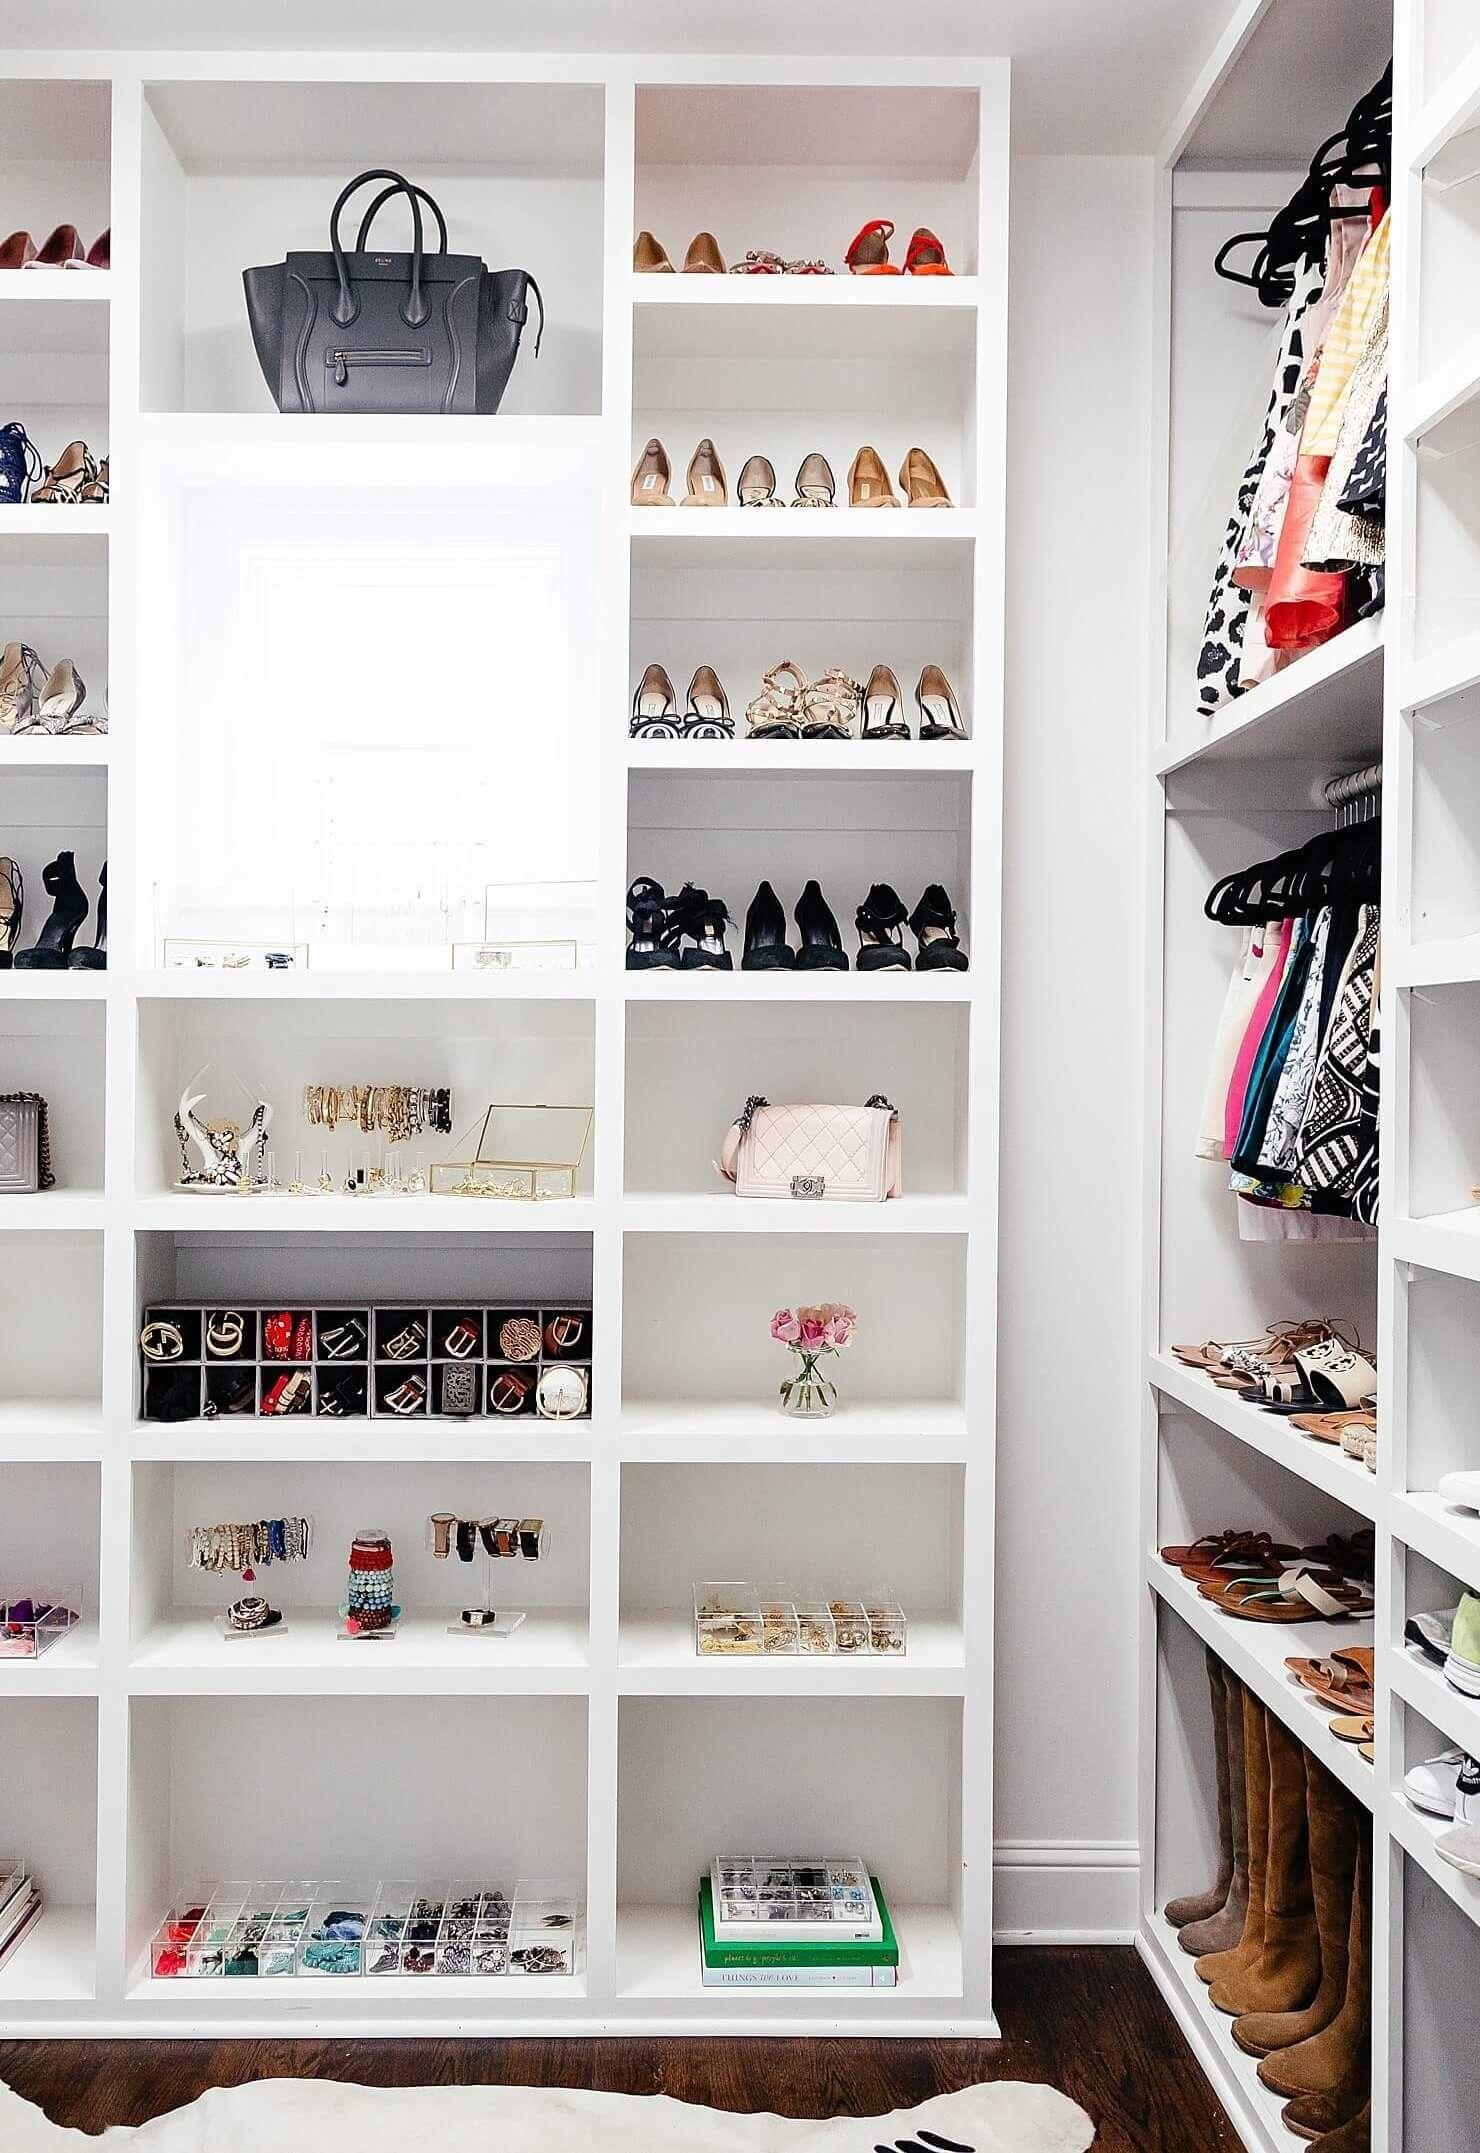 Modern style plus closet organization This bright